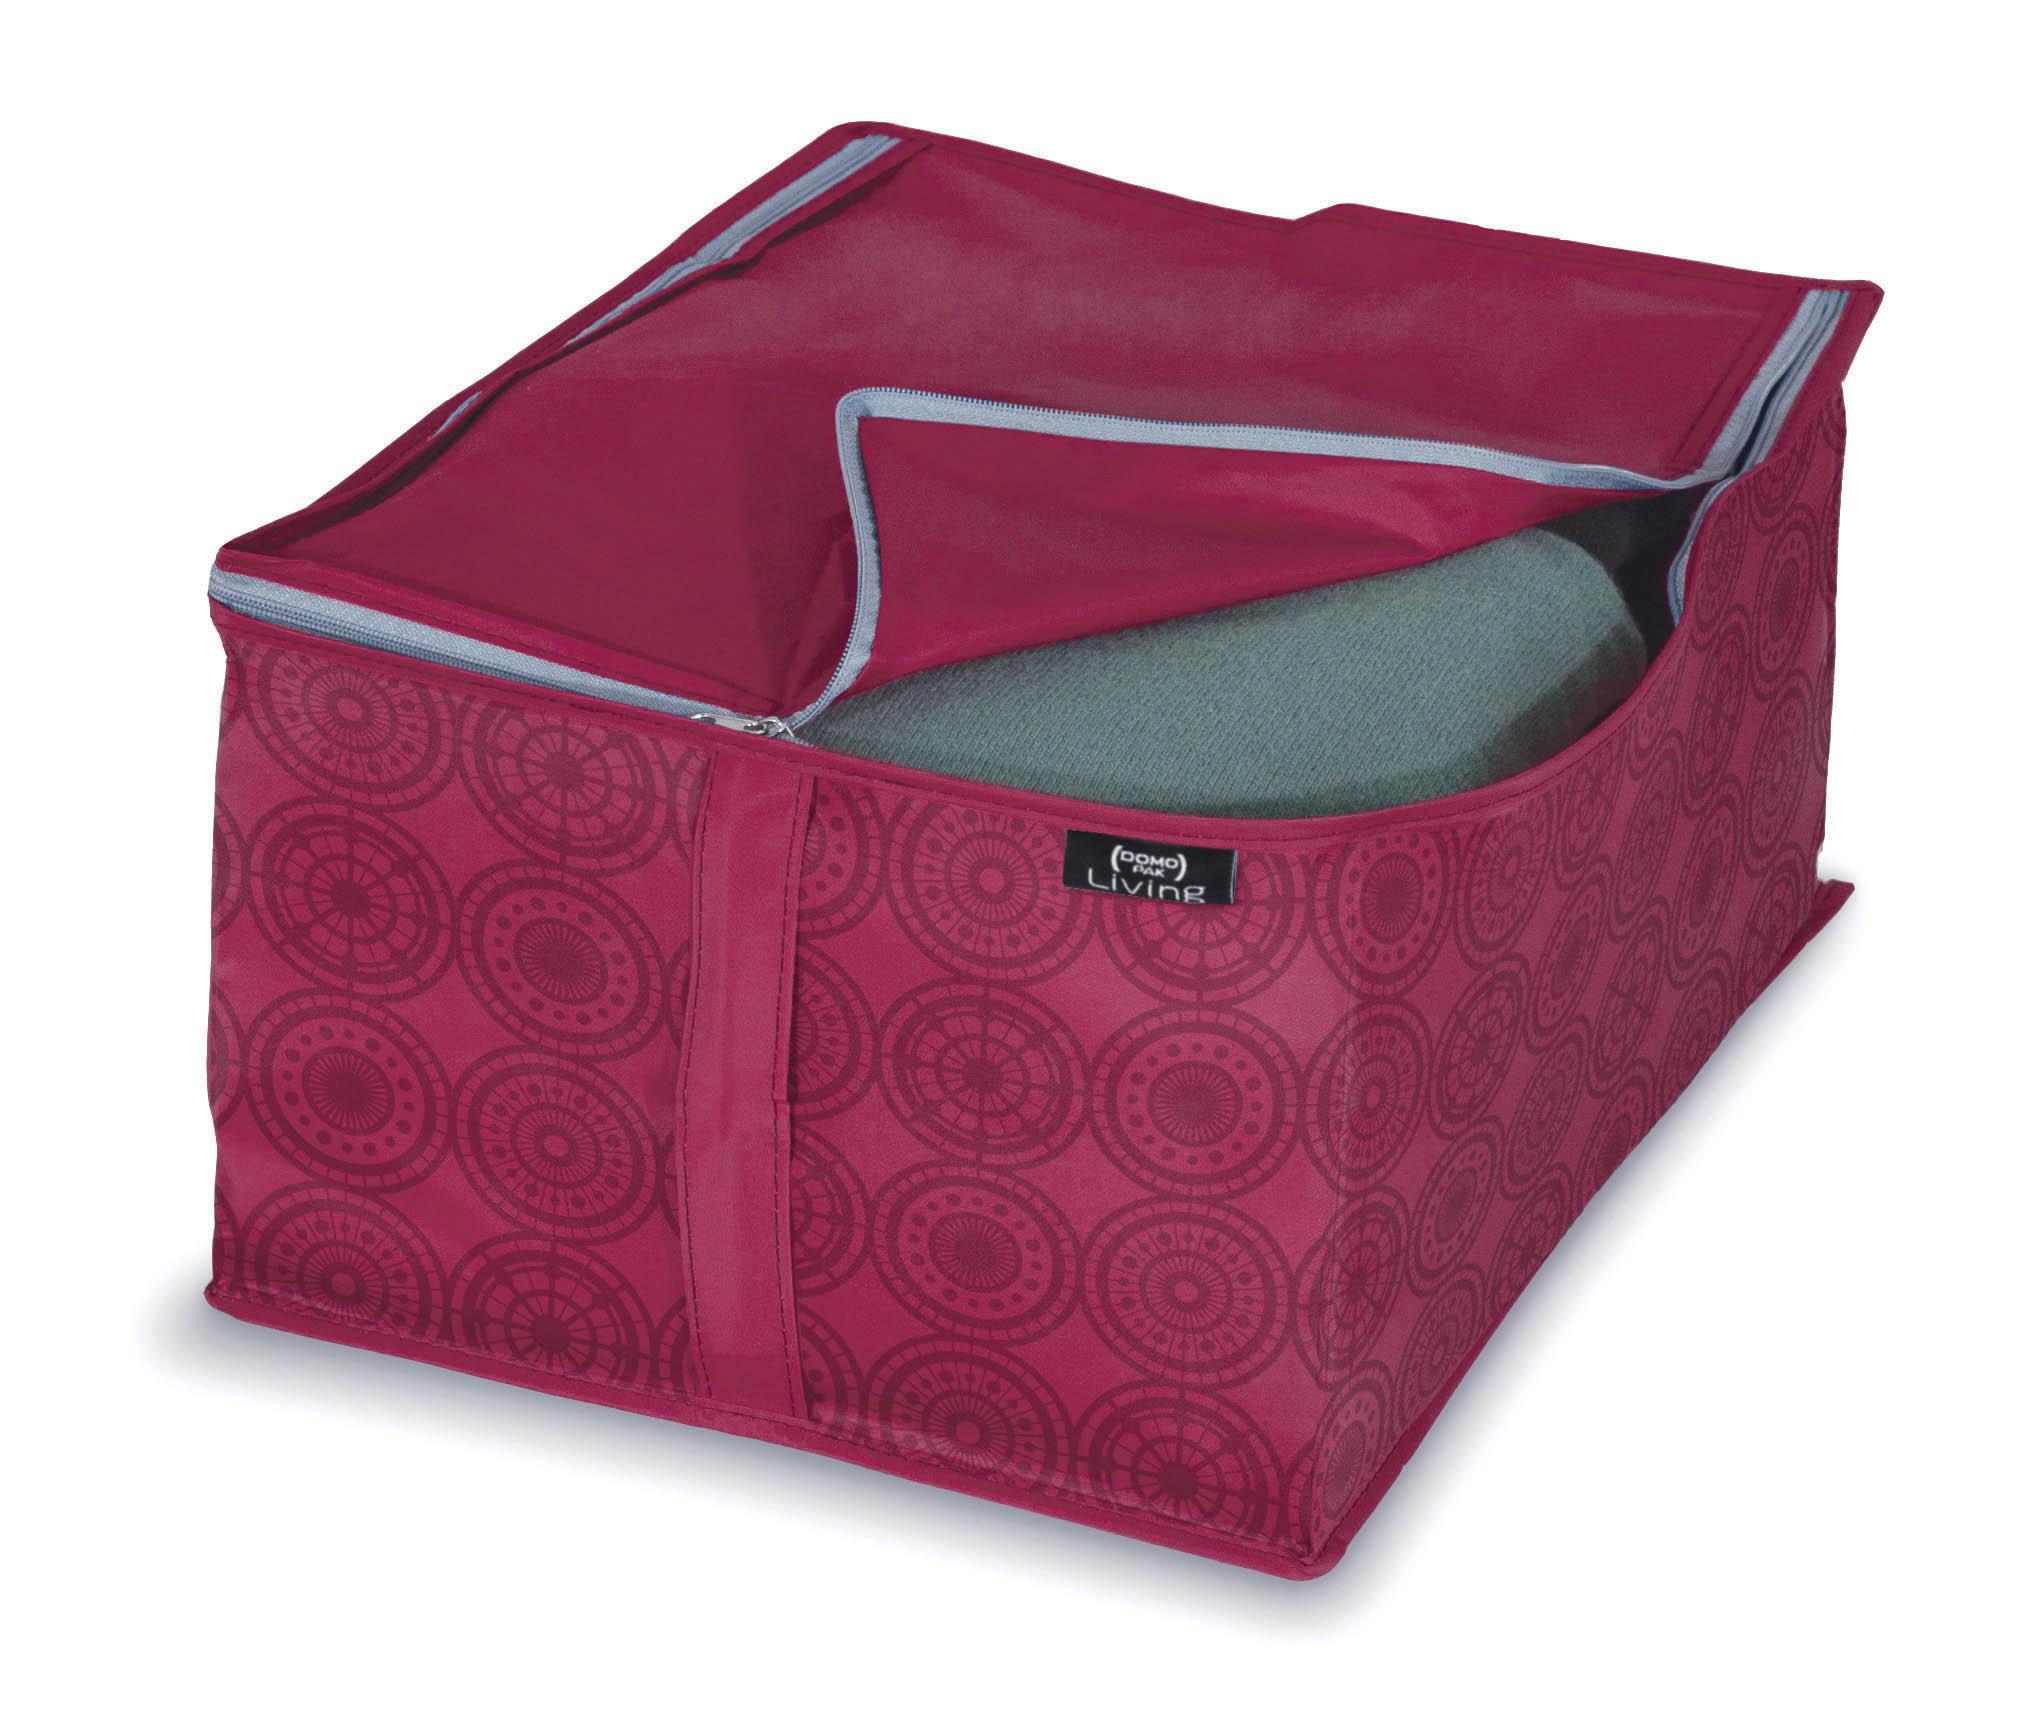 DOMOPAK Living Úložné boxy růžové Velikost: malý